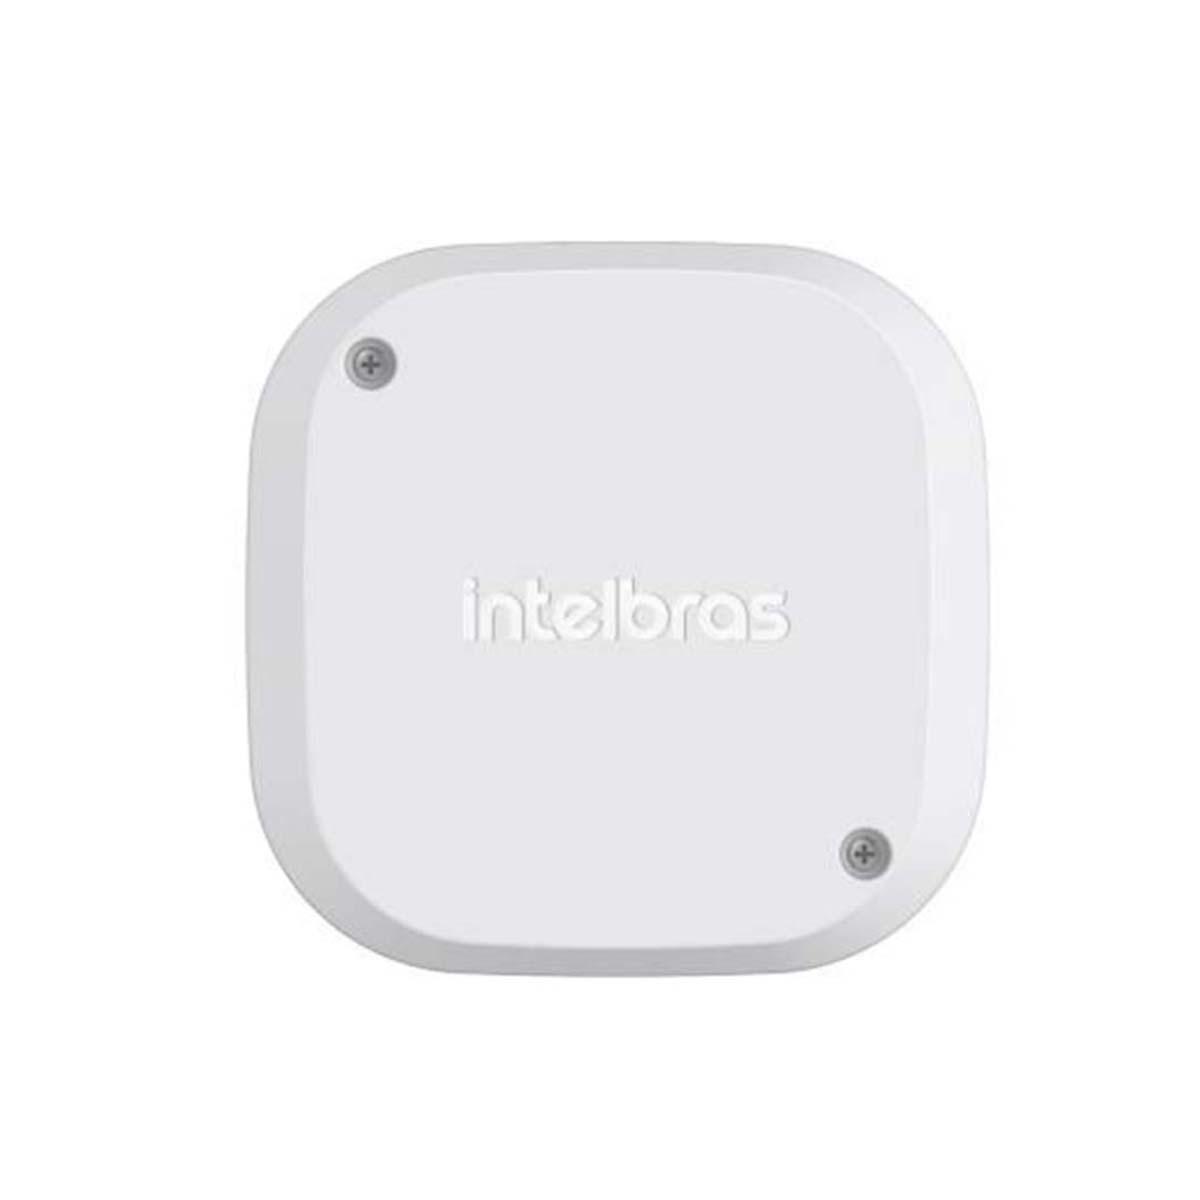 KIT 02 CAIXA PLASTICA DE PASSAGEM VBOX 1100 INTELBRAS